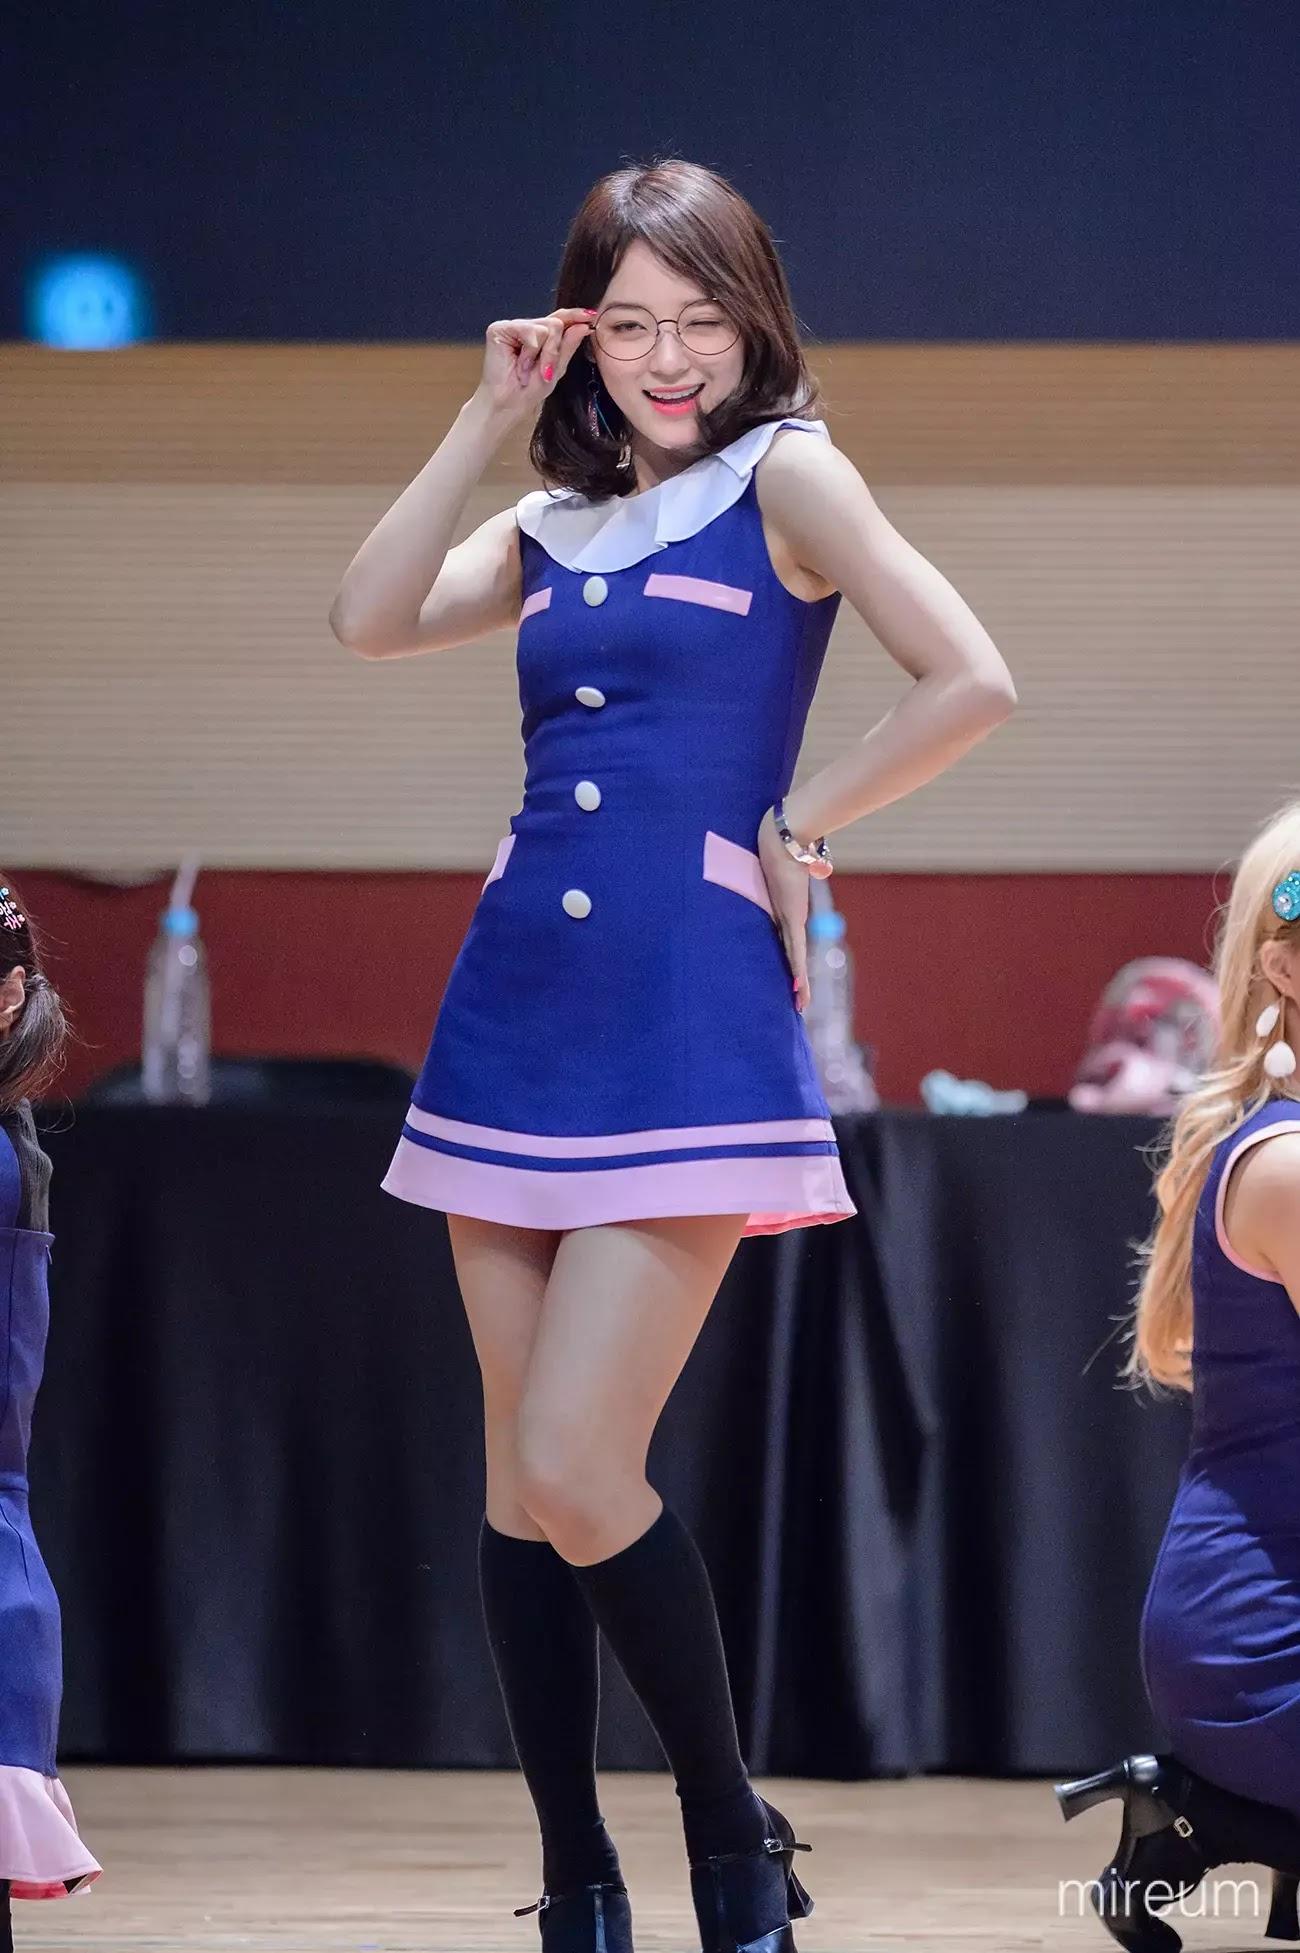 170311 gugudan - Dongdaemun Fansign Event - 288p